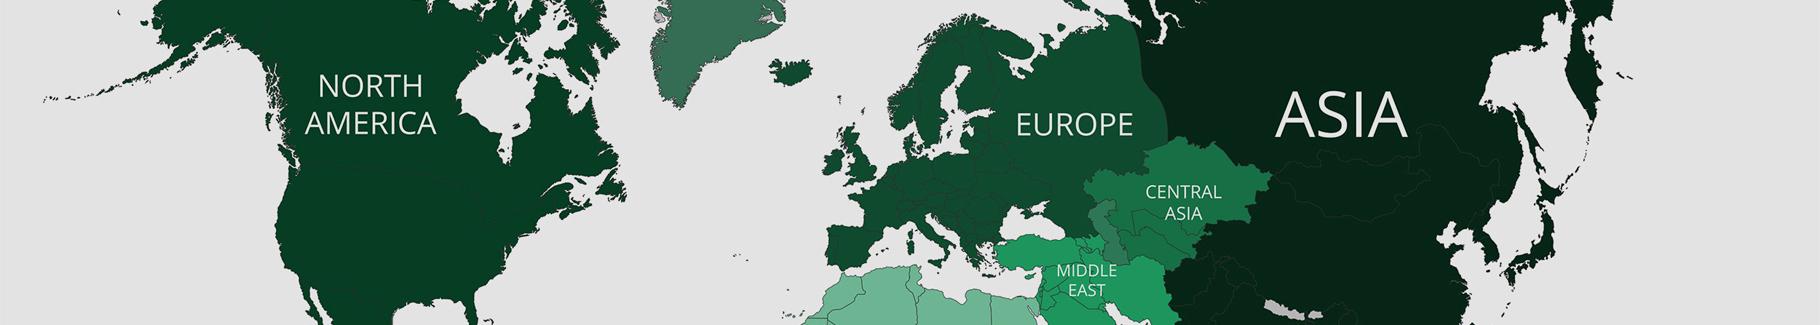 Plakat zielona mapa